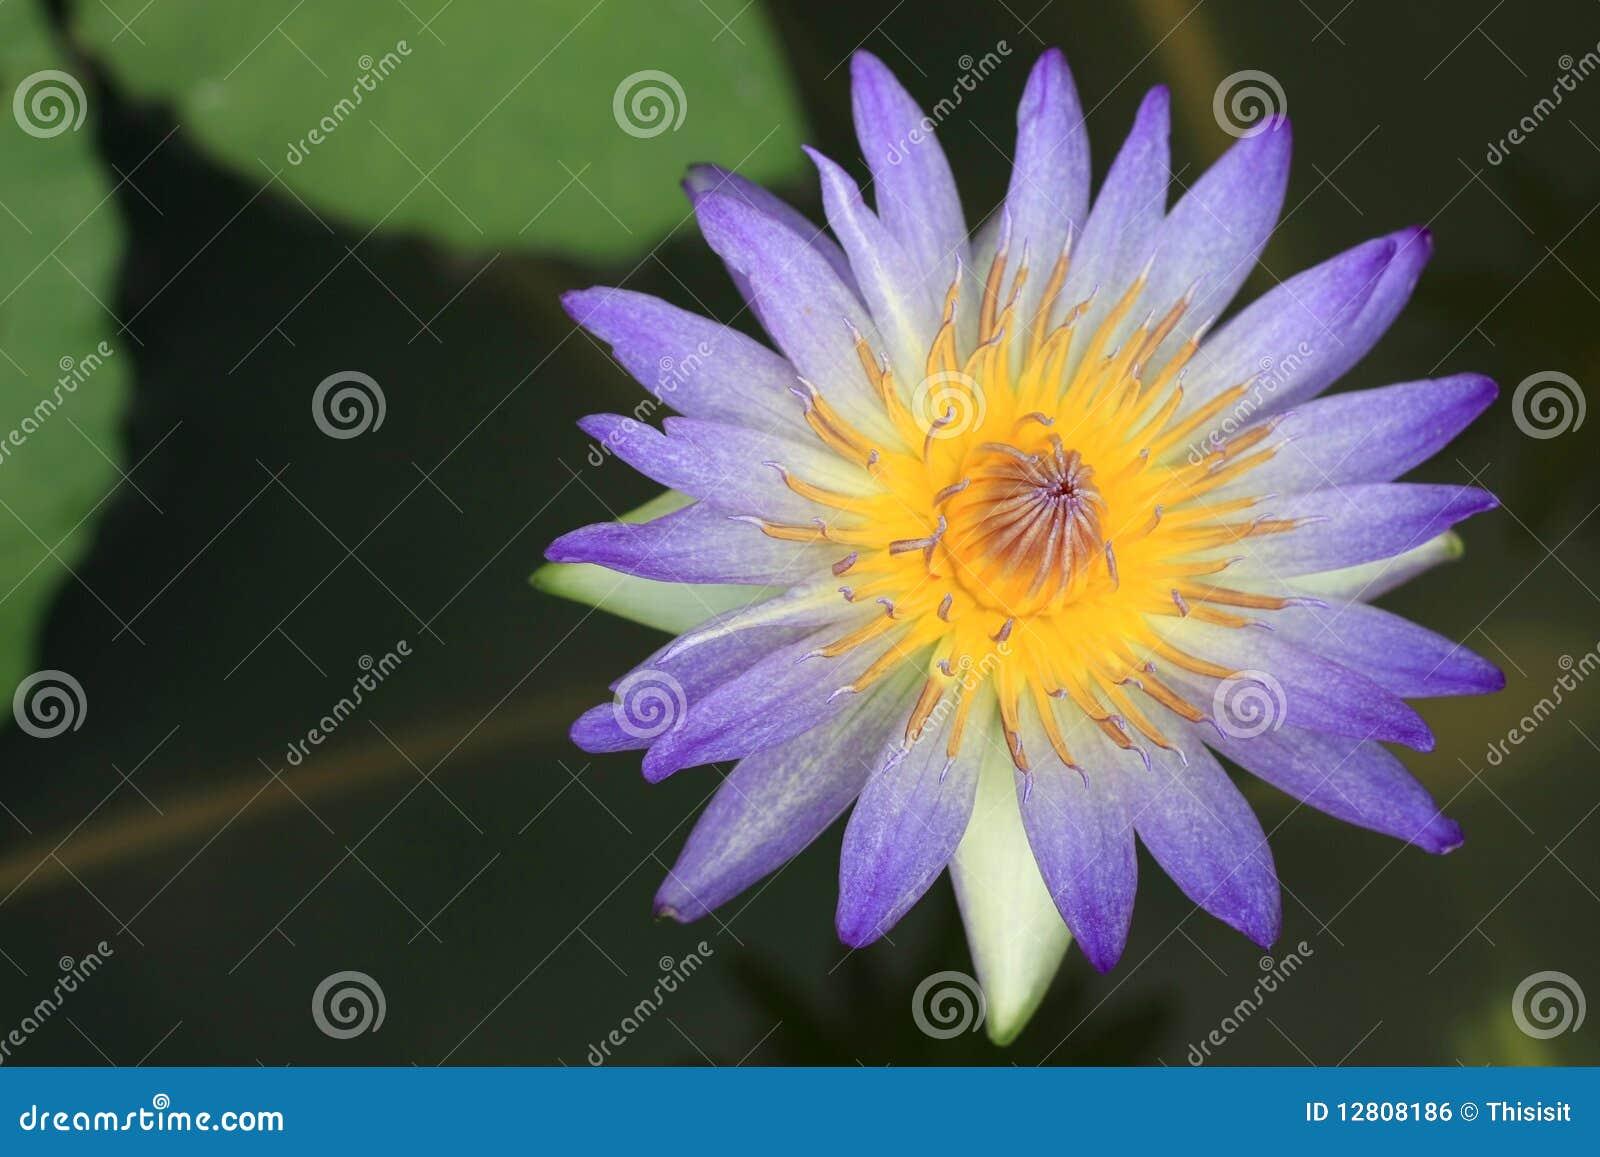 Blue Lotus Flowers Royalty Free Stock Image Image